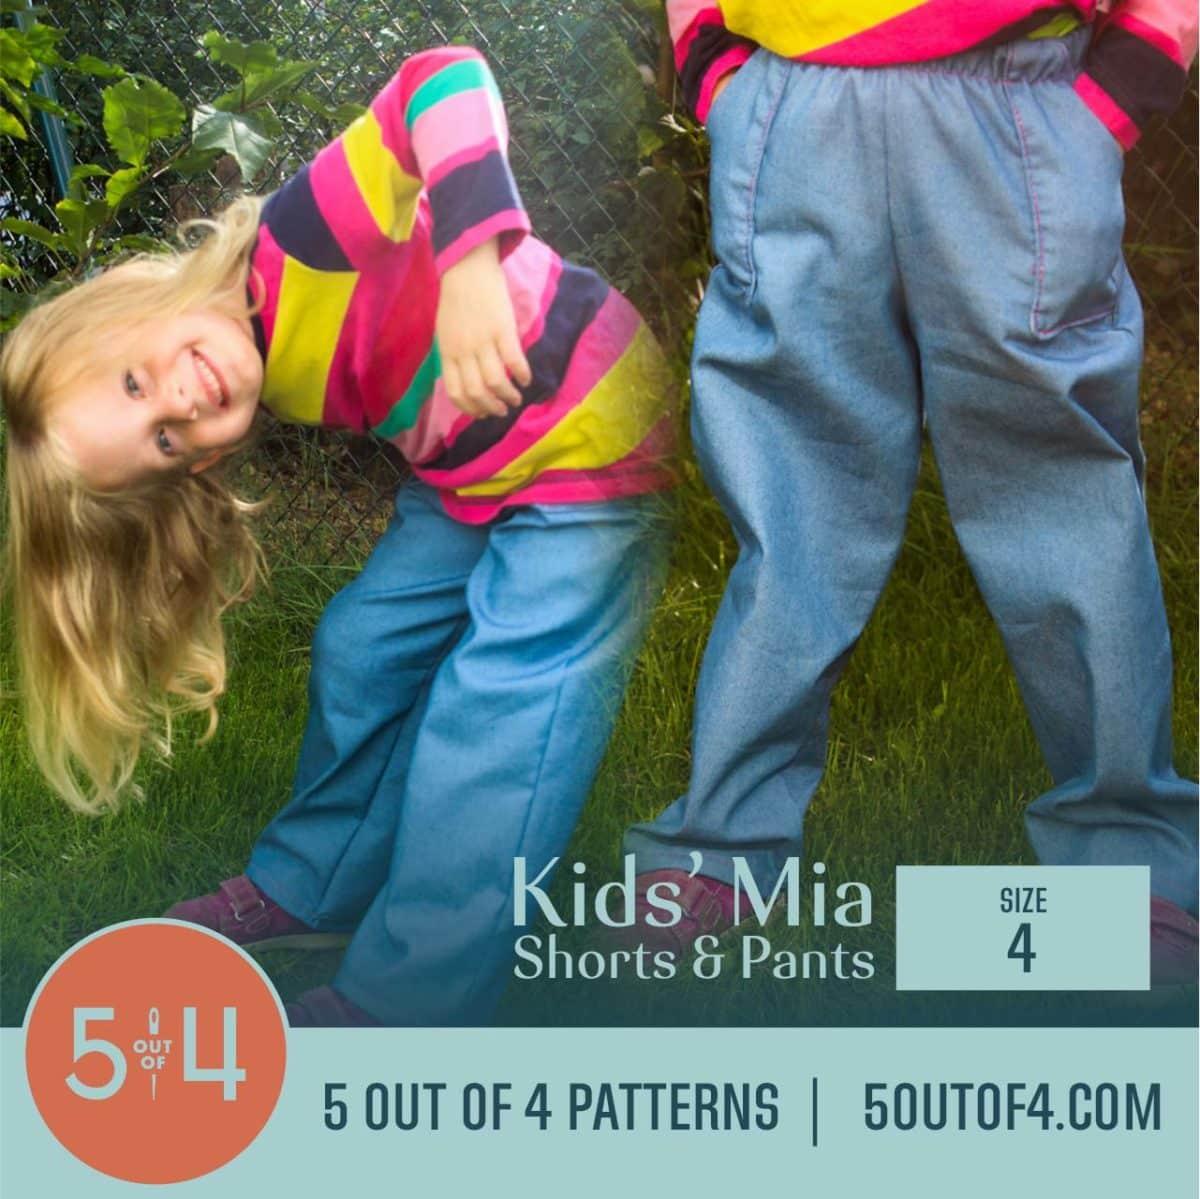 5oo4 Patterns Kids' Mia Pants Size 4